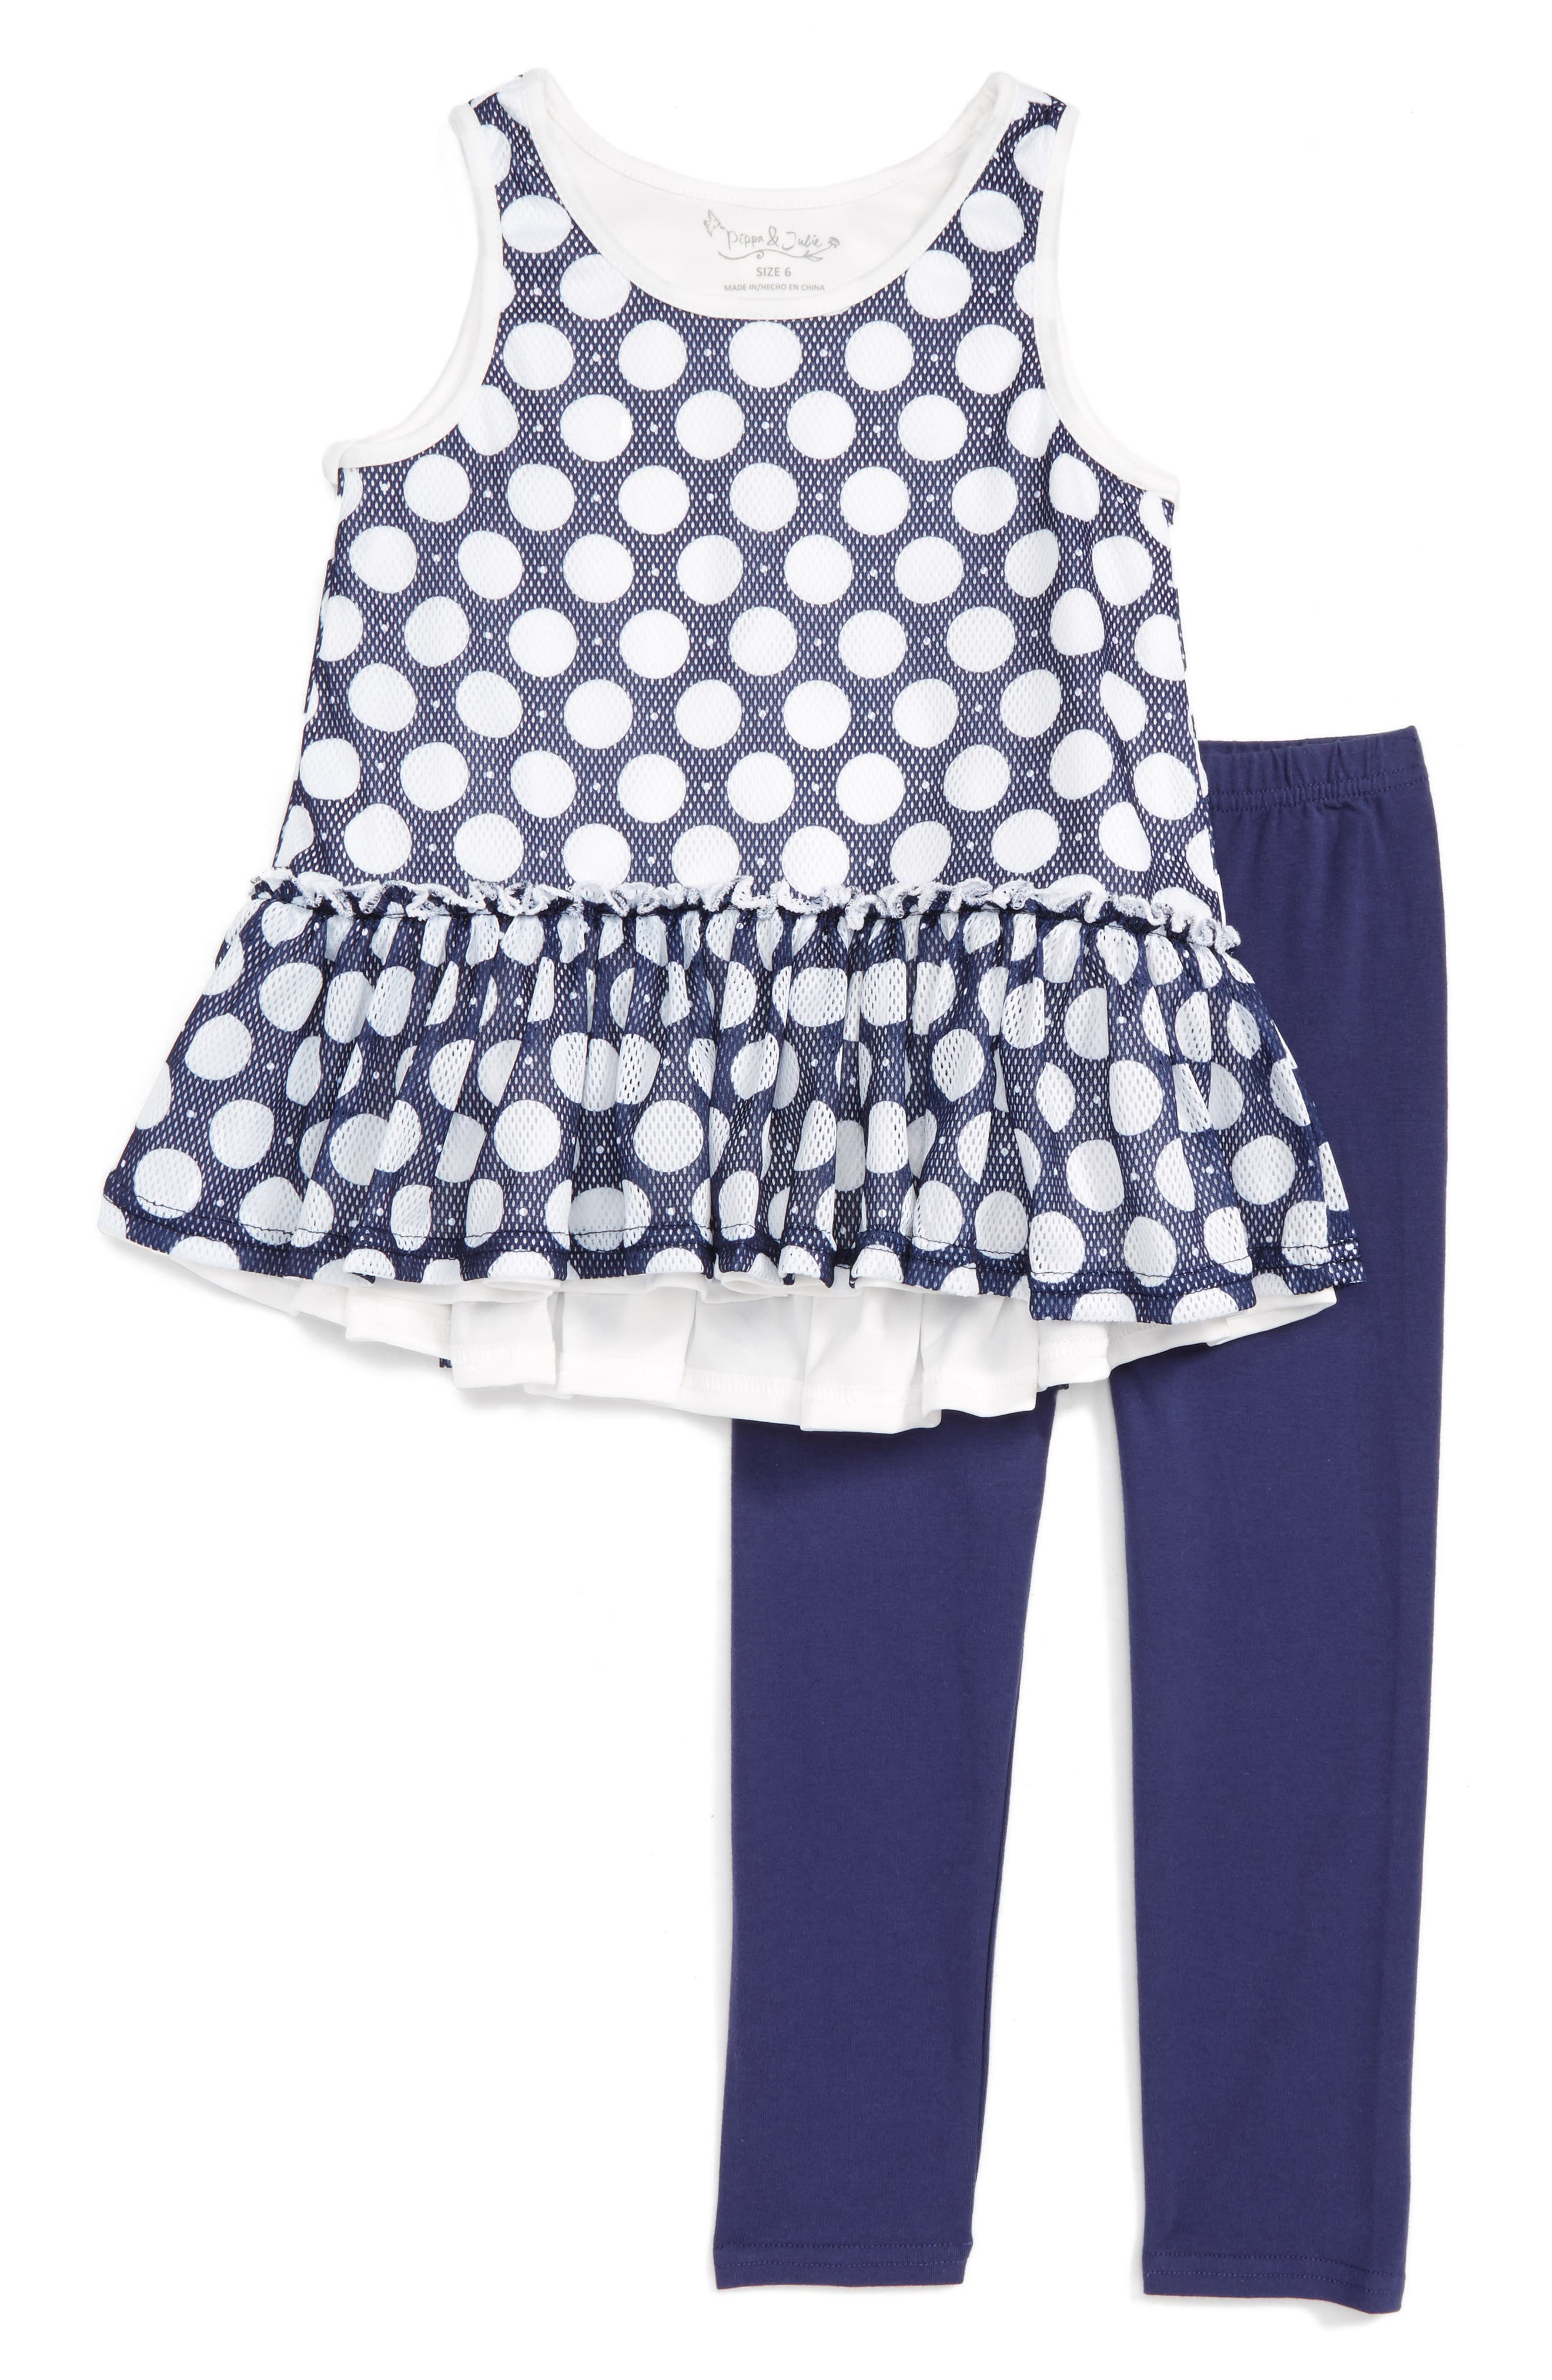 Pippa & Julie Polka Dot Peplum Top & Leggings (Toddler Girls & Little Girls)